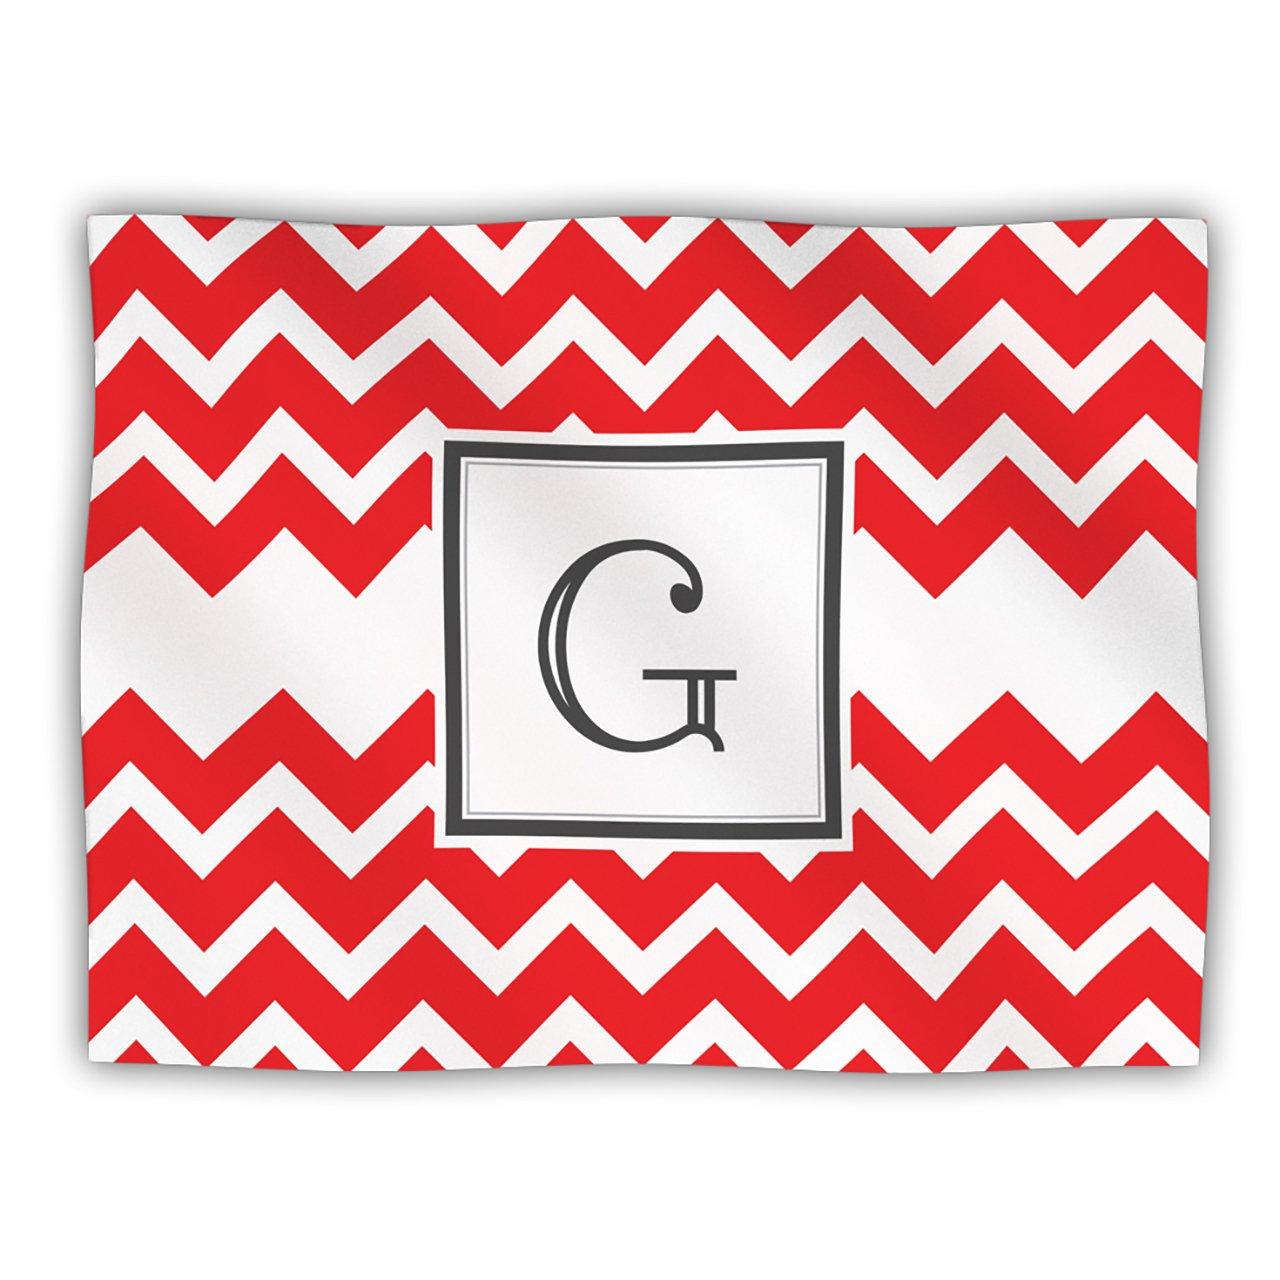 Kess InHouse Kess Original 'Monogram Chevron Red Letter G' Dog Blanket, 40 by 30-Inch